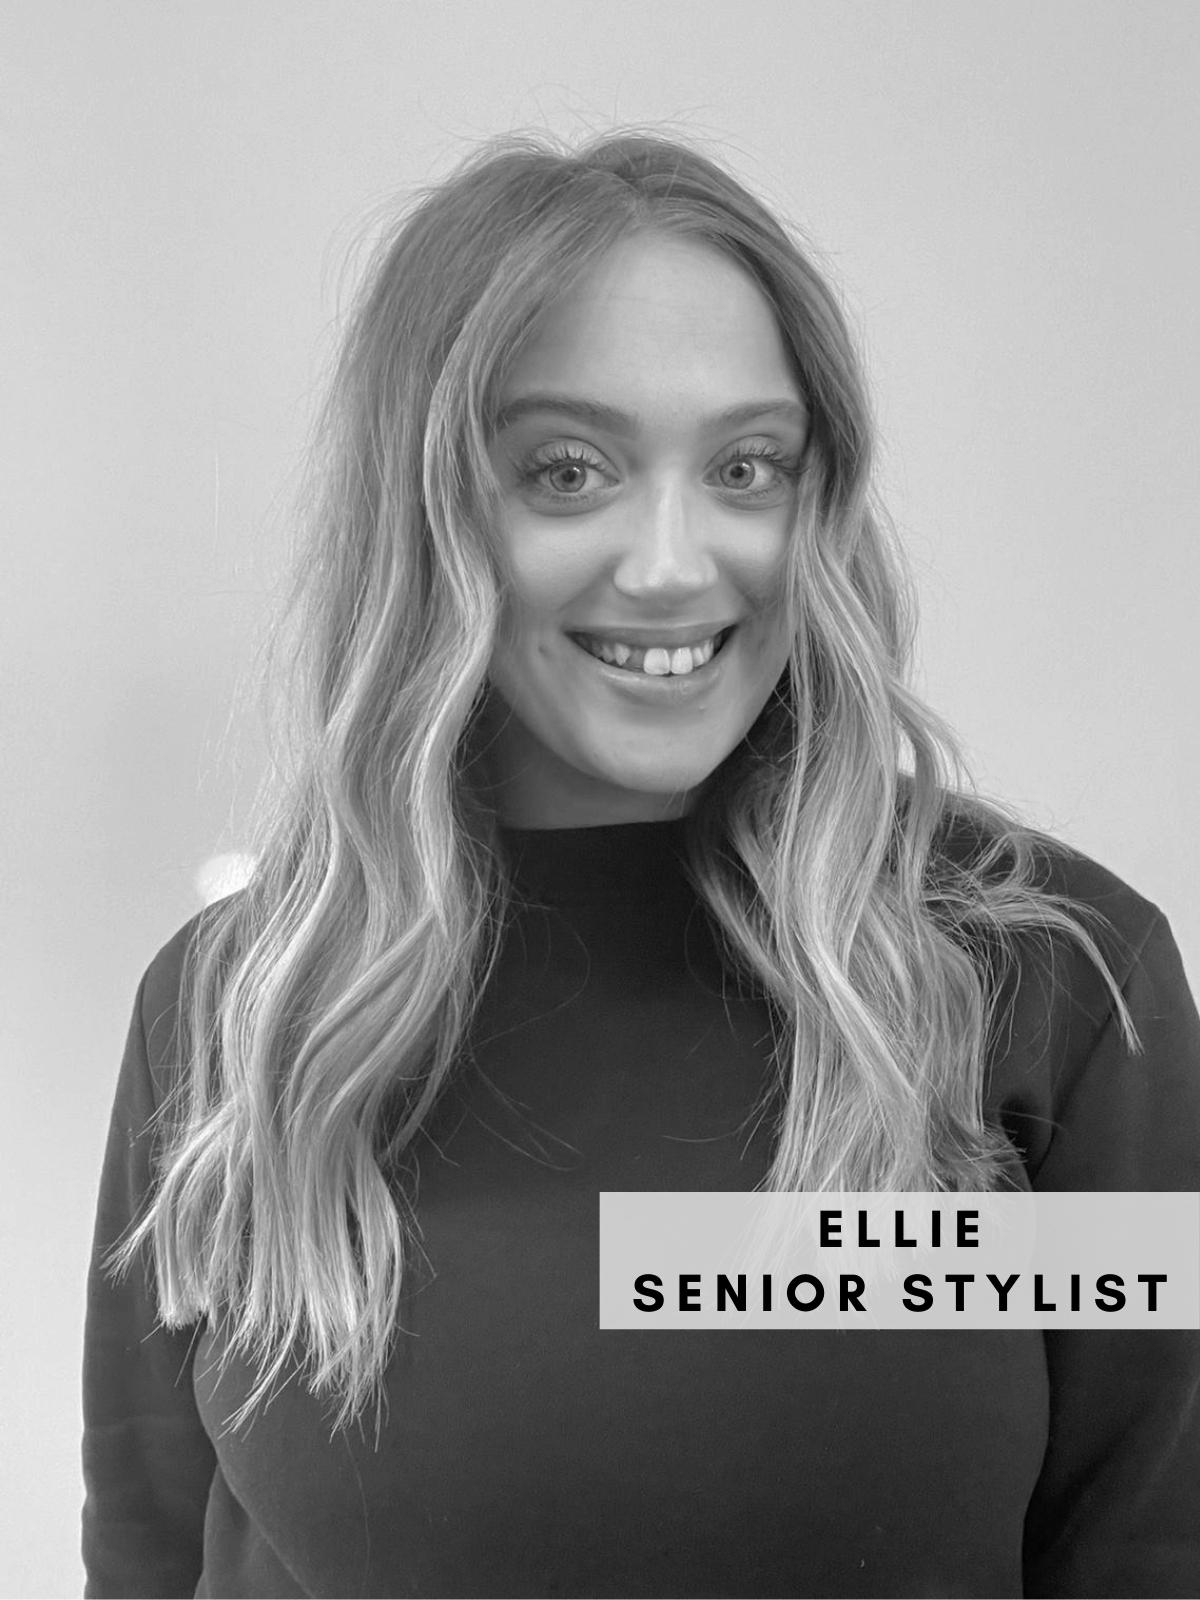 Ellie- Senior Stylist